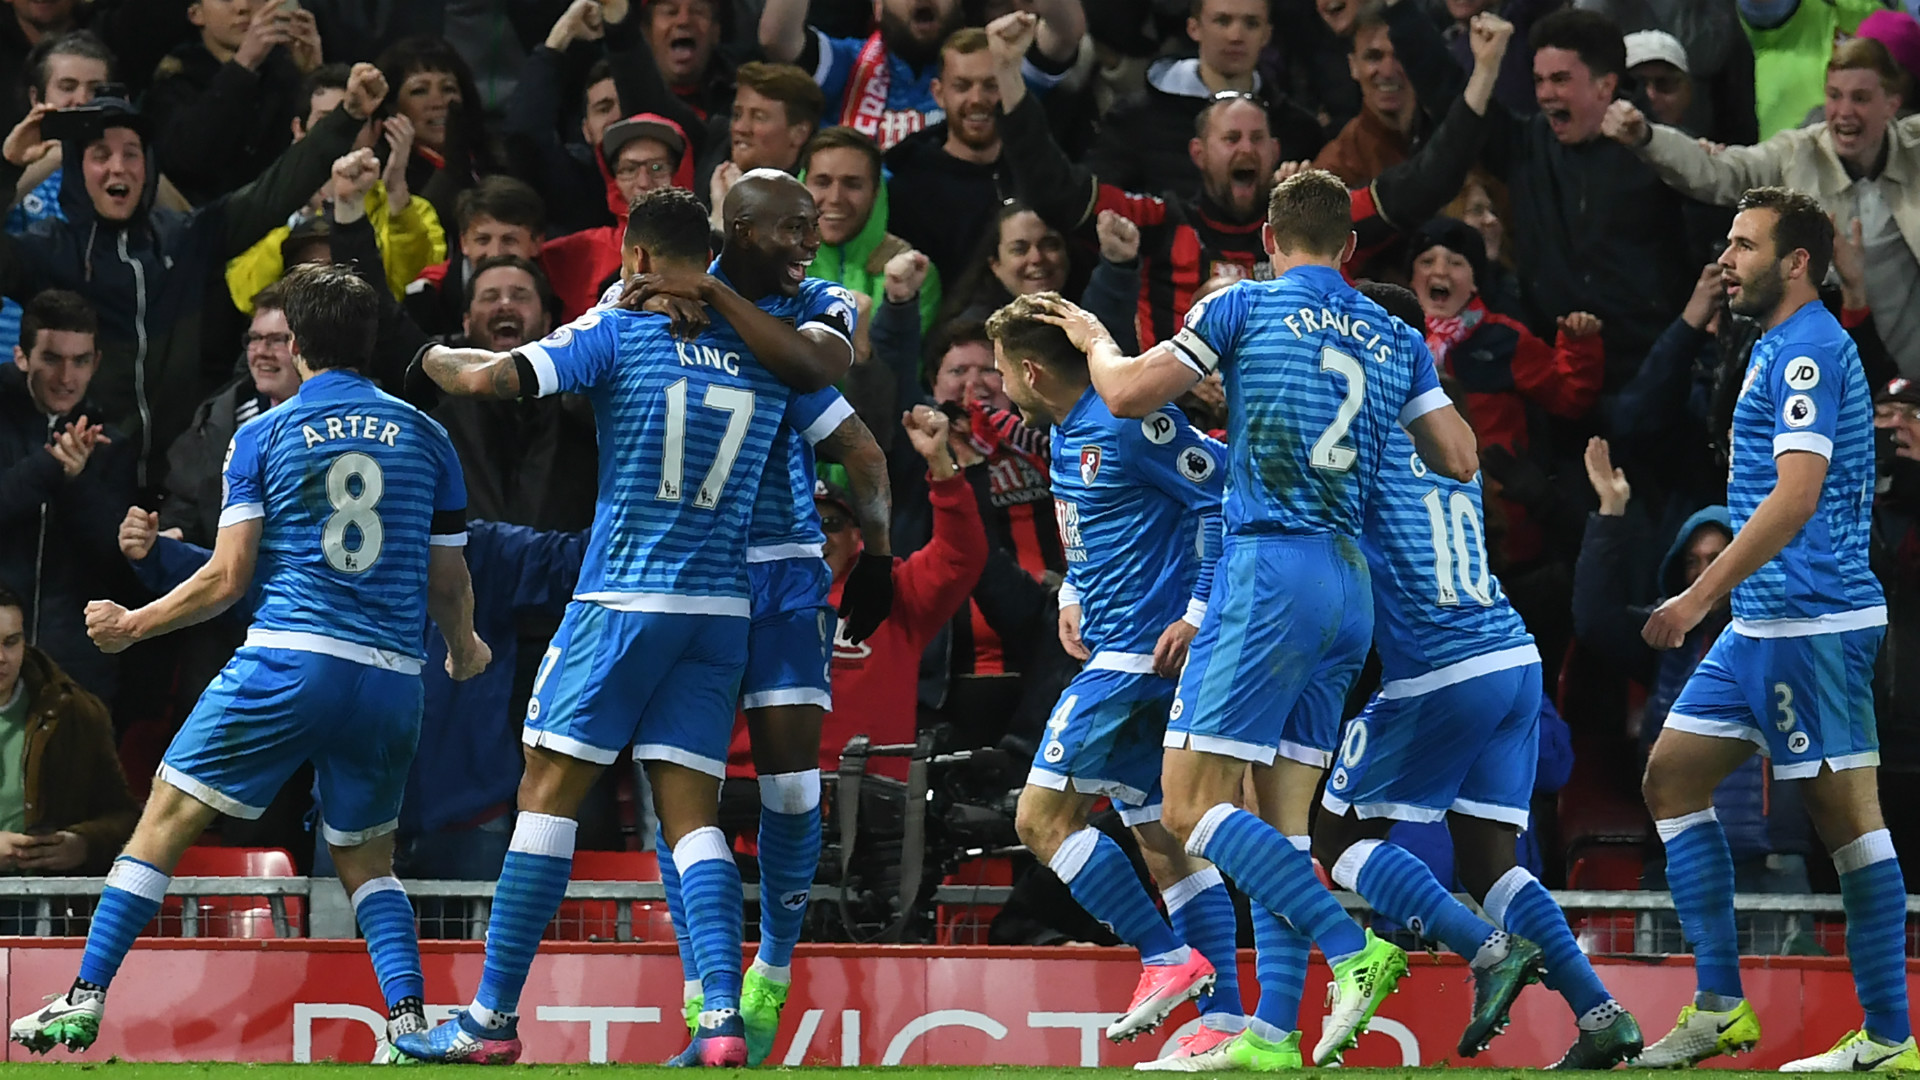 HD Bournemouth celebrate v Liverpool 2-2